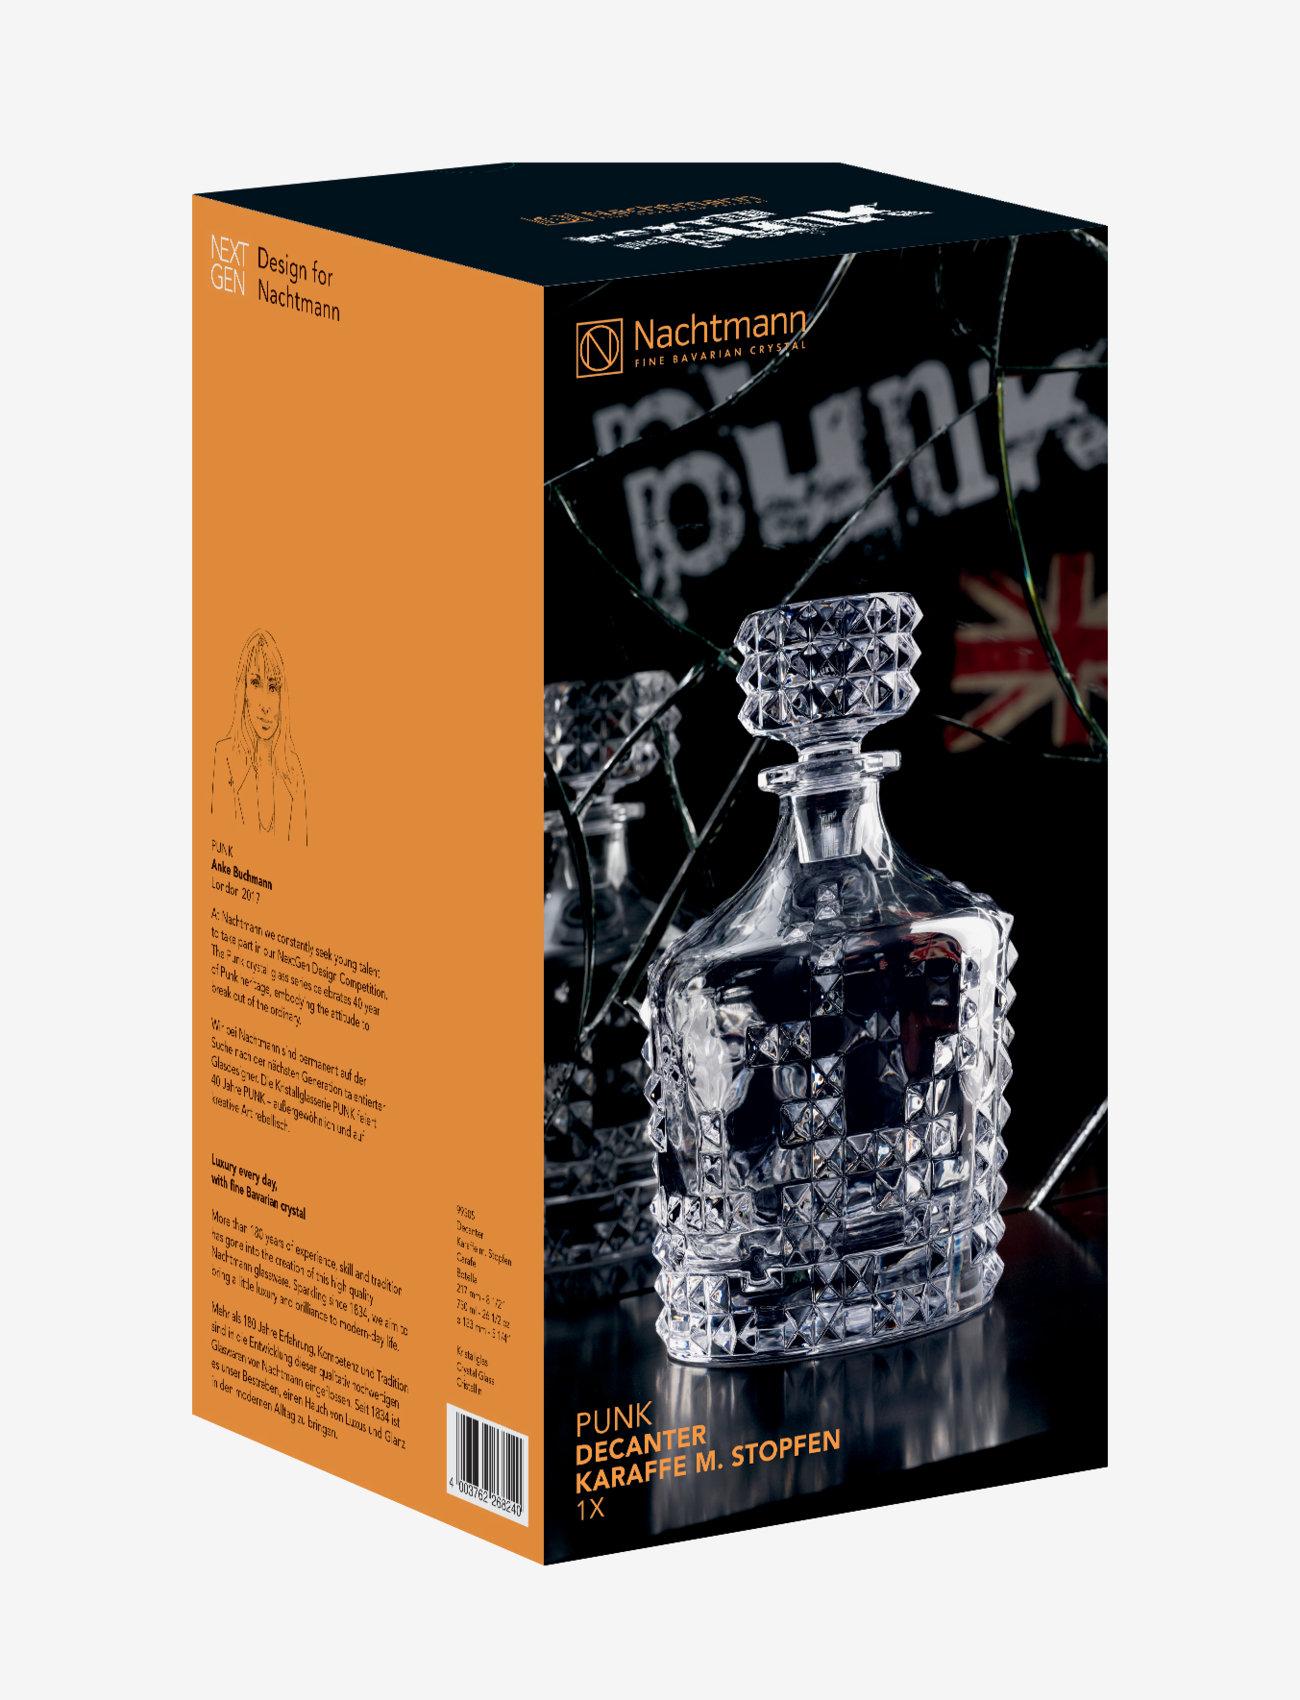 Nachtmann - Punk karahvi 0,75L - viinikarahvit - clear glass - 1